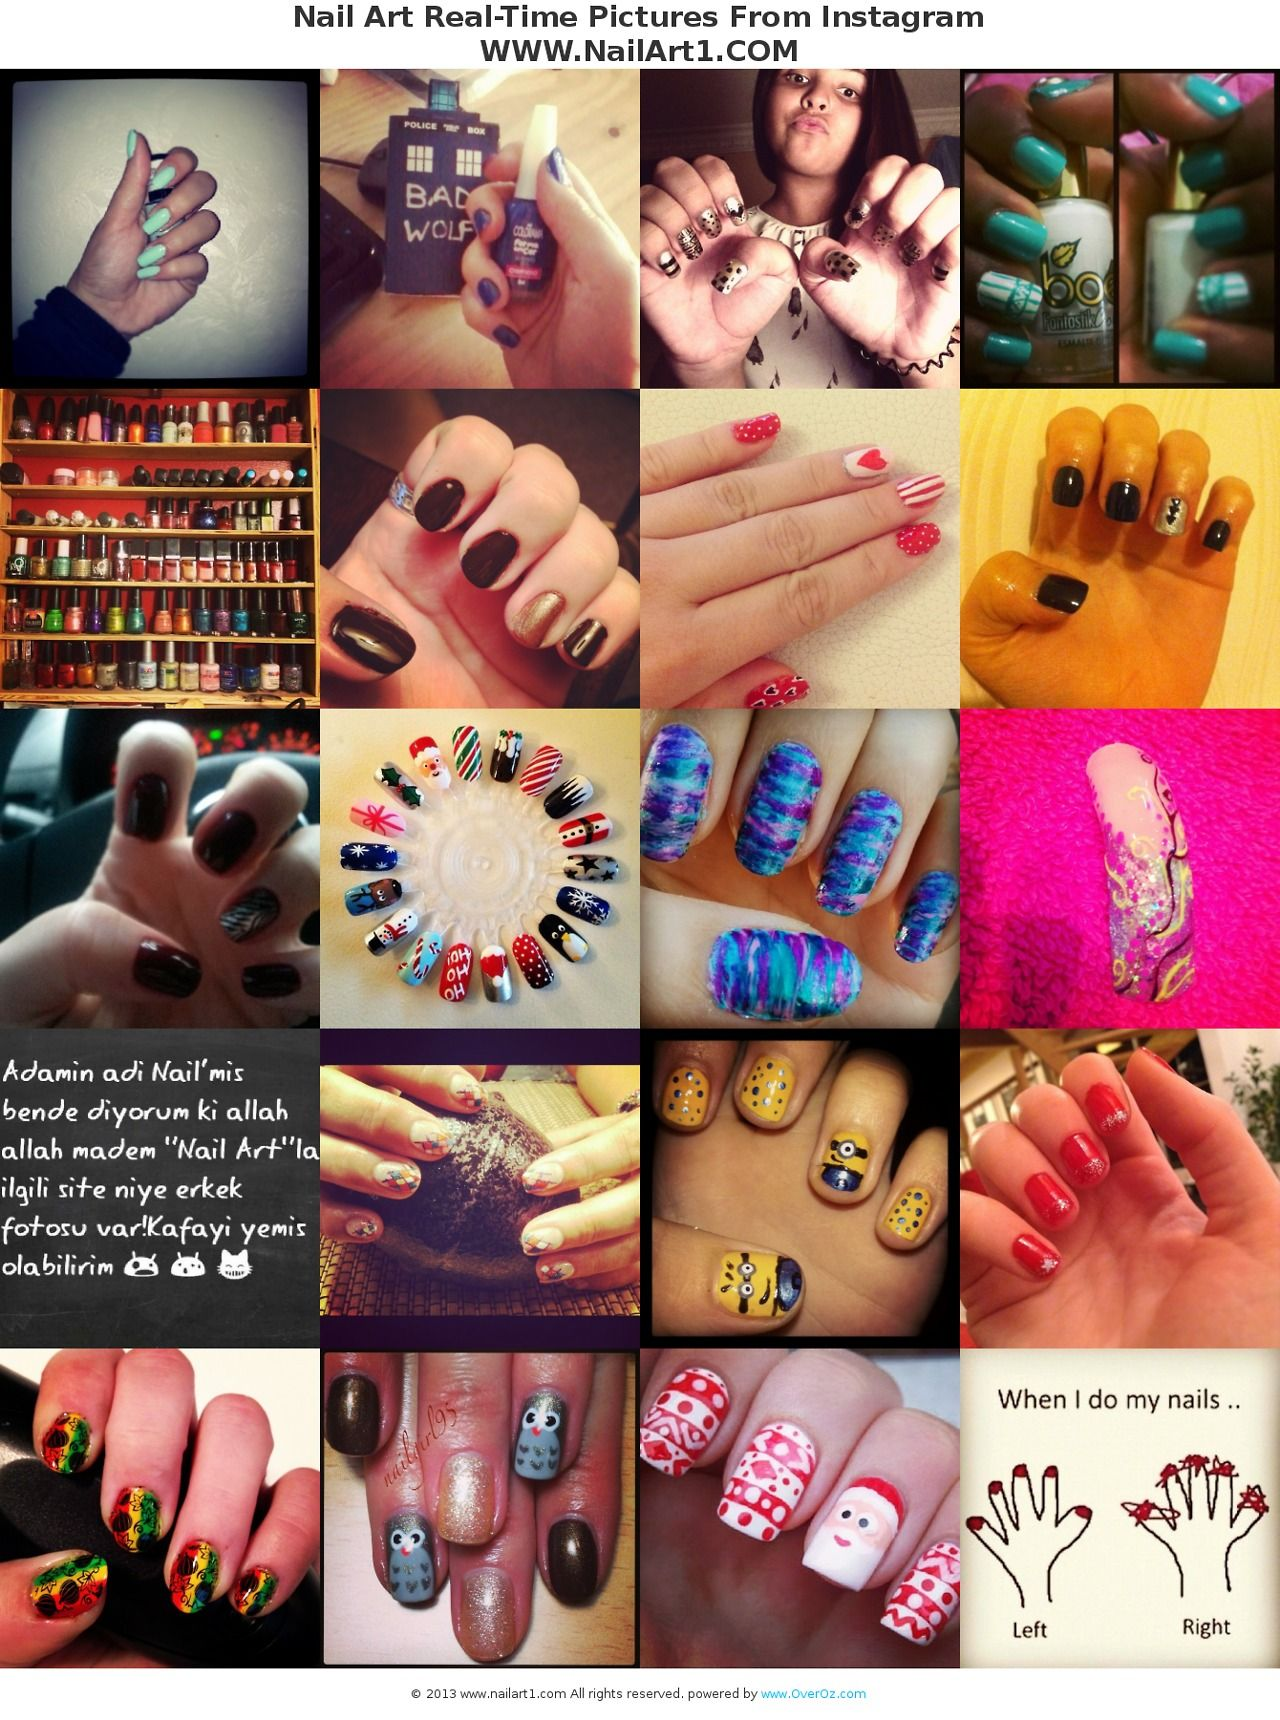 Nail Art - Source: http://www.nailart1.com